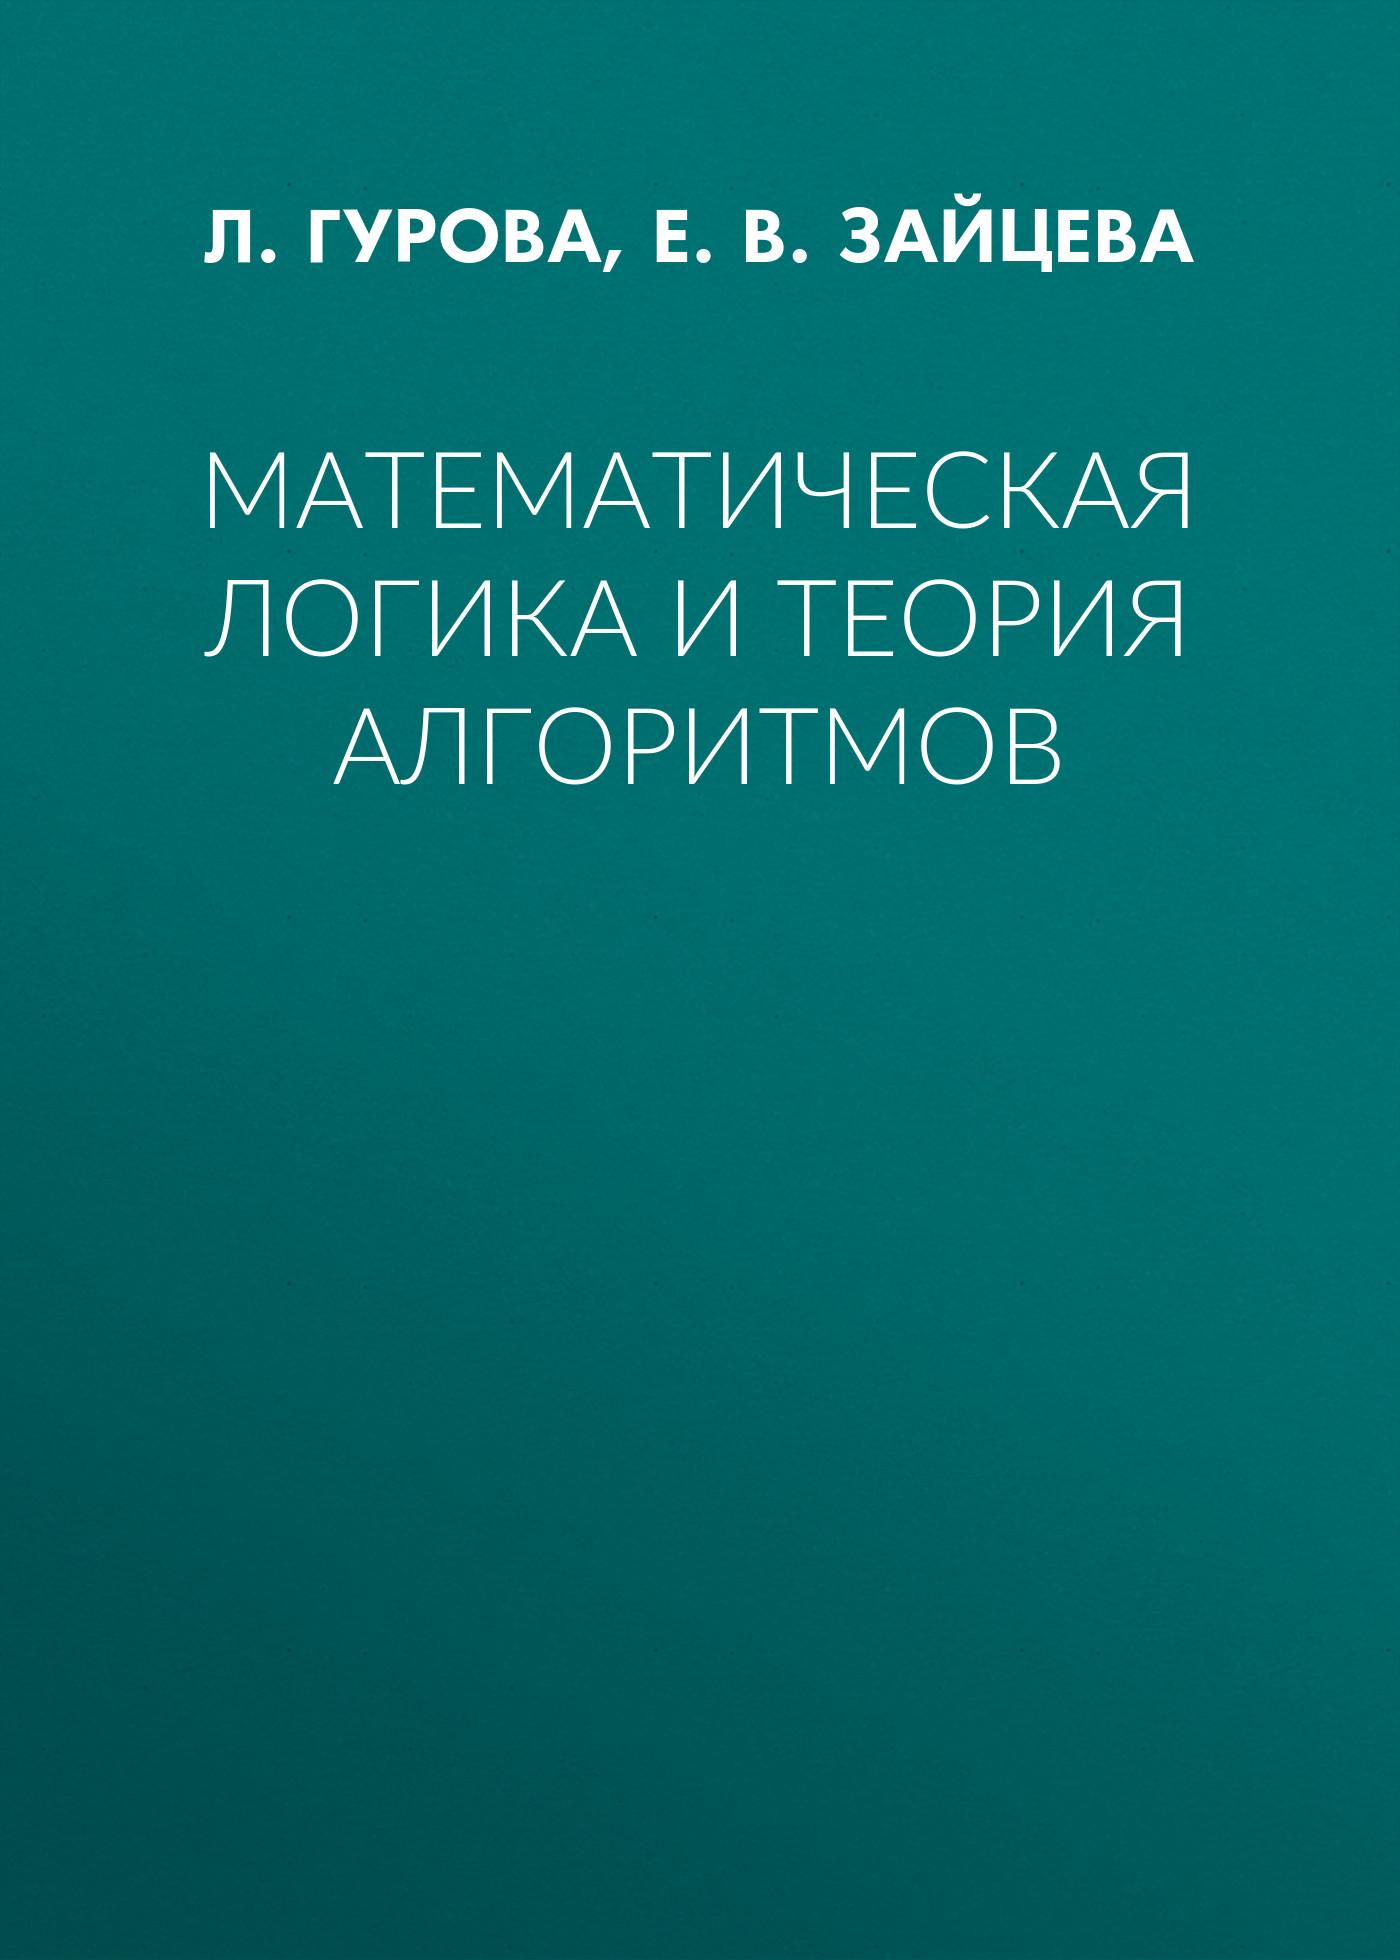 Е. В. Зайцева Математическая логика и теория алгоритмов глухов м шишков а математическая логика дискретные функции теория алгоритмов учебное пособие isbn 9785811413447